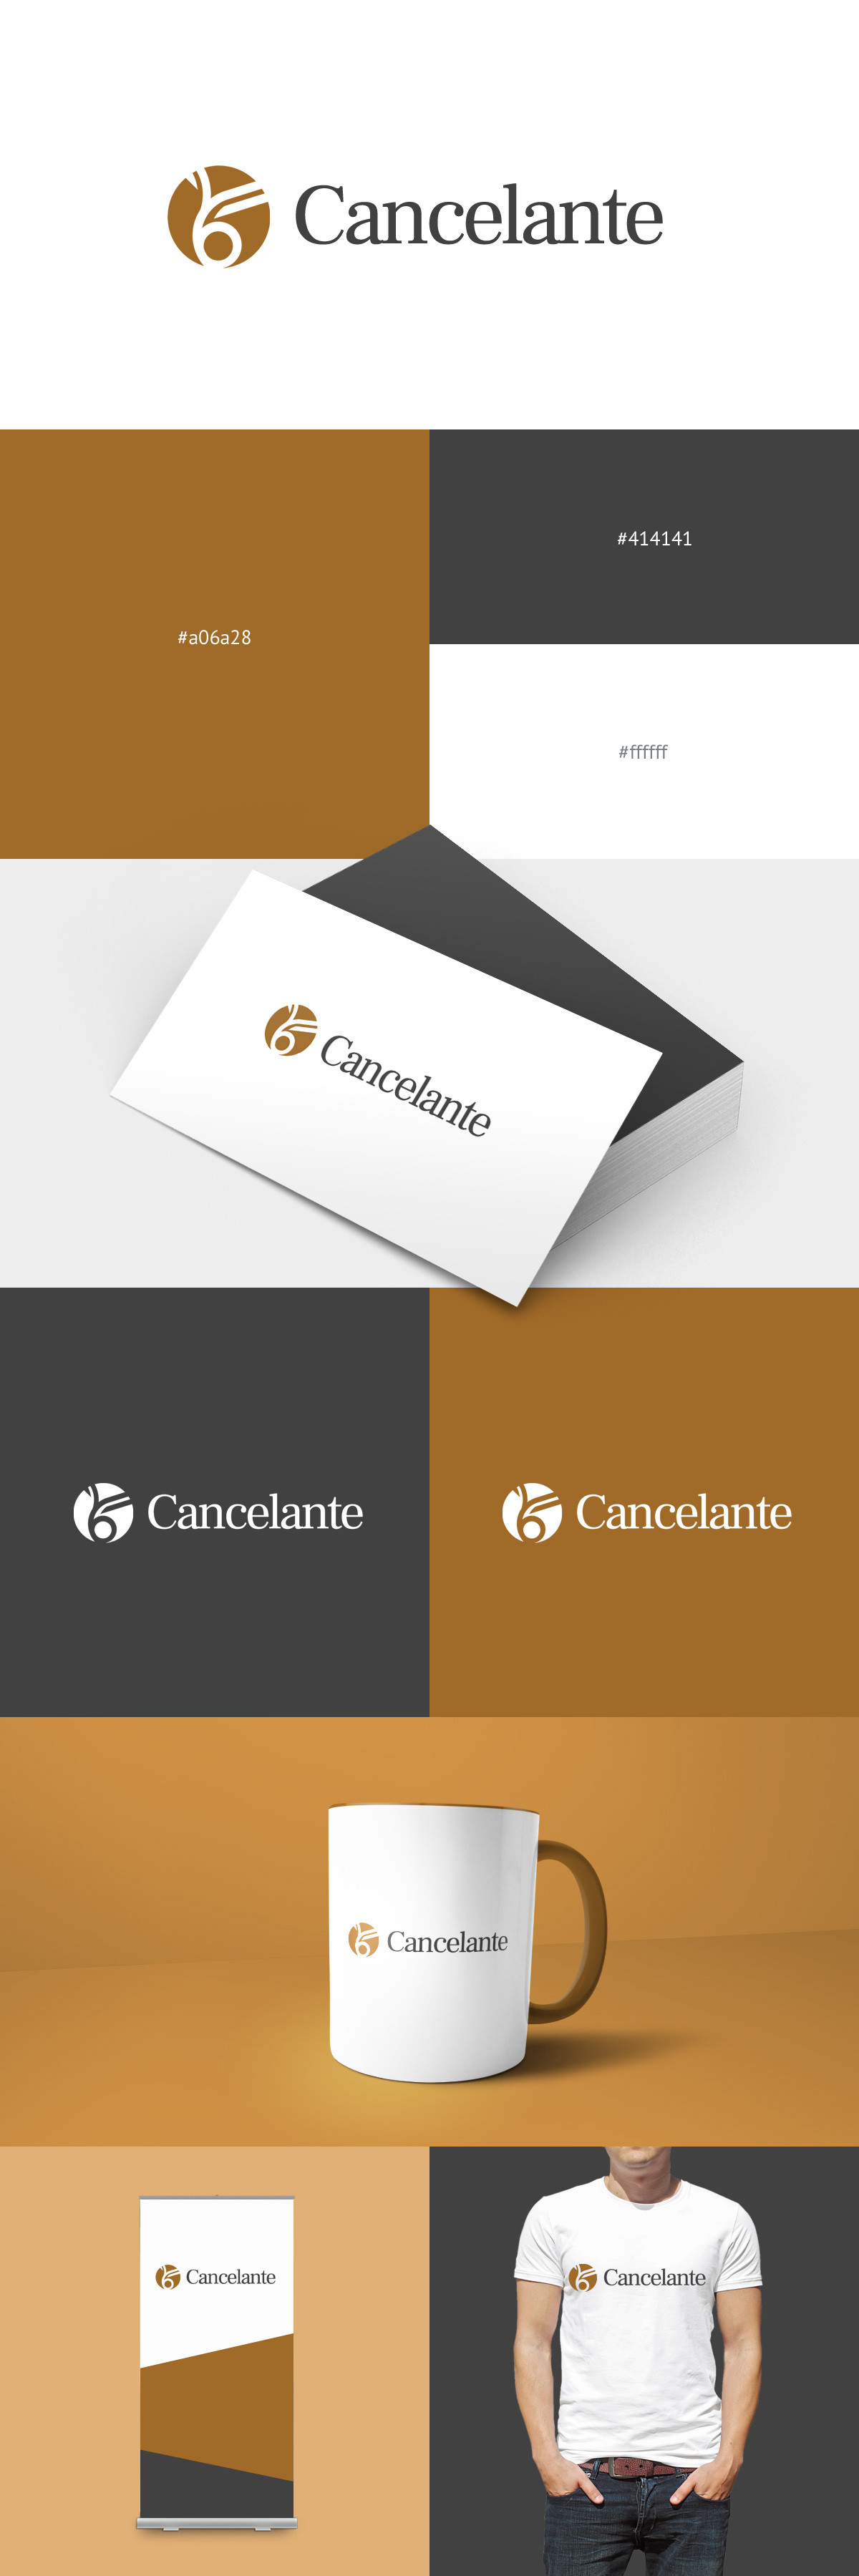 projekt-logo-kancelarie-prawne-cancelante